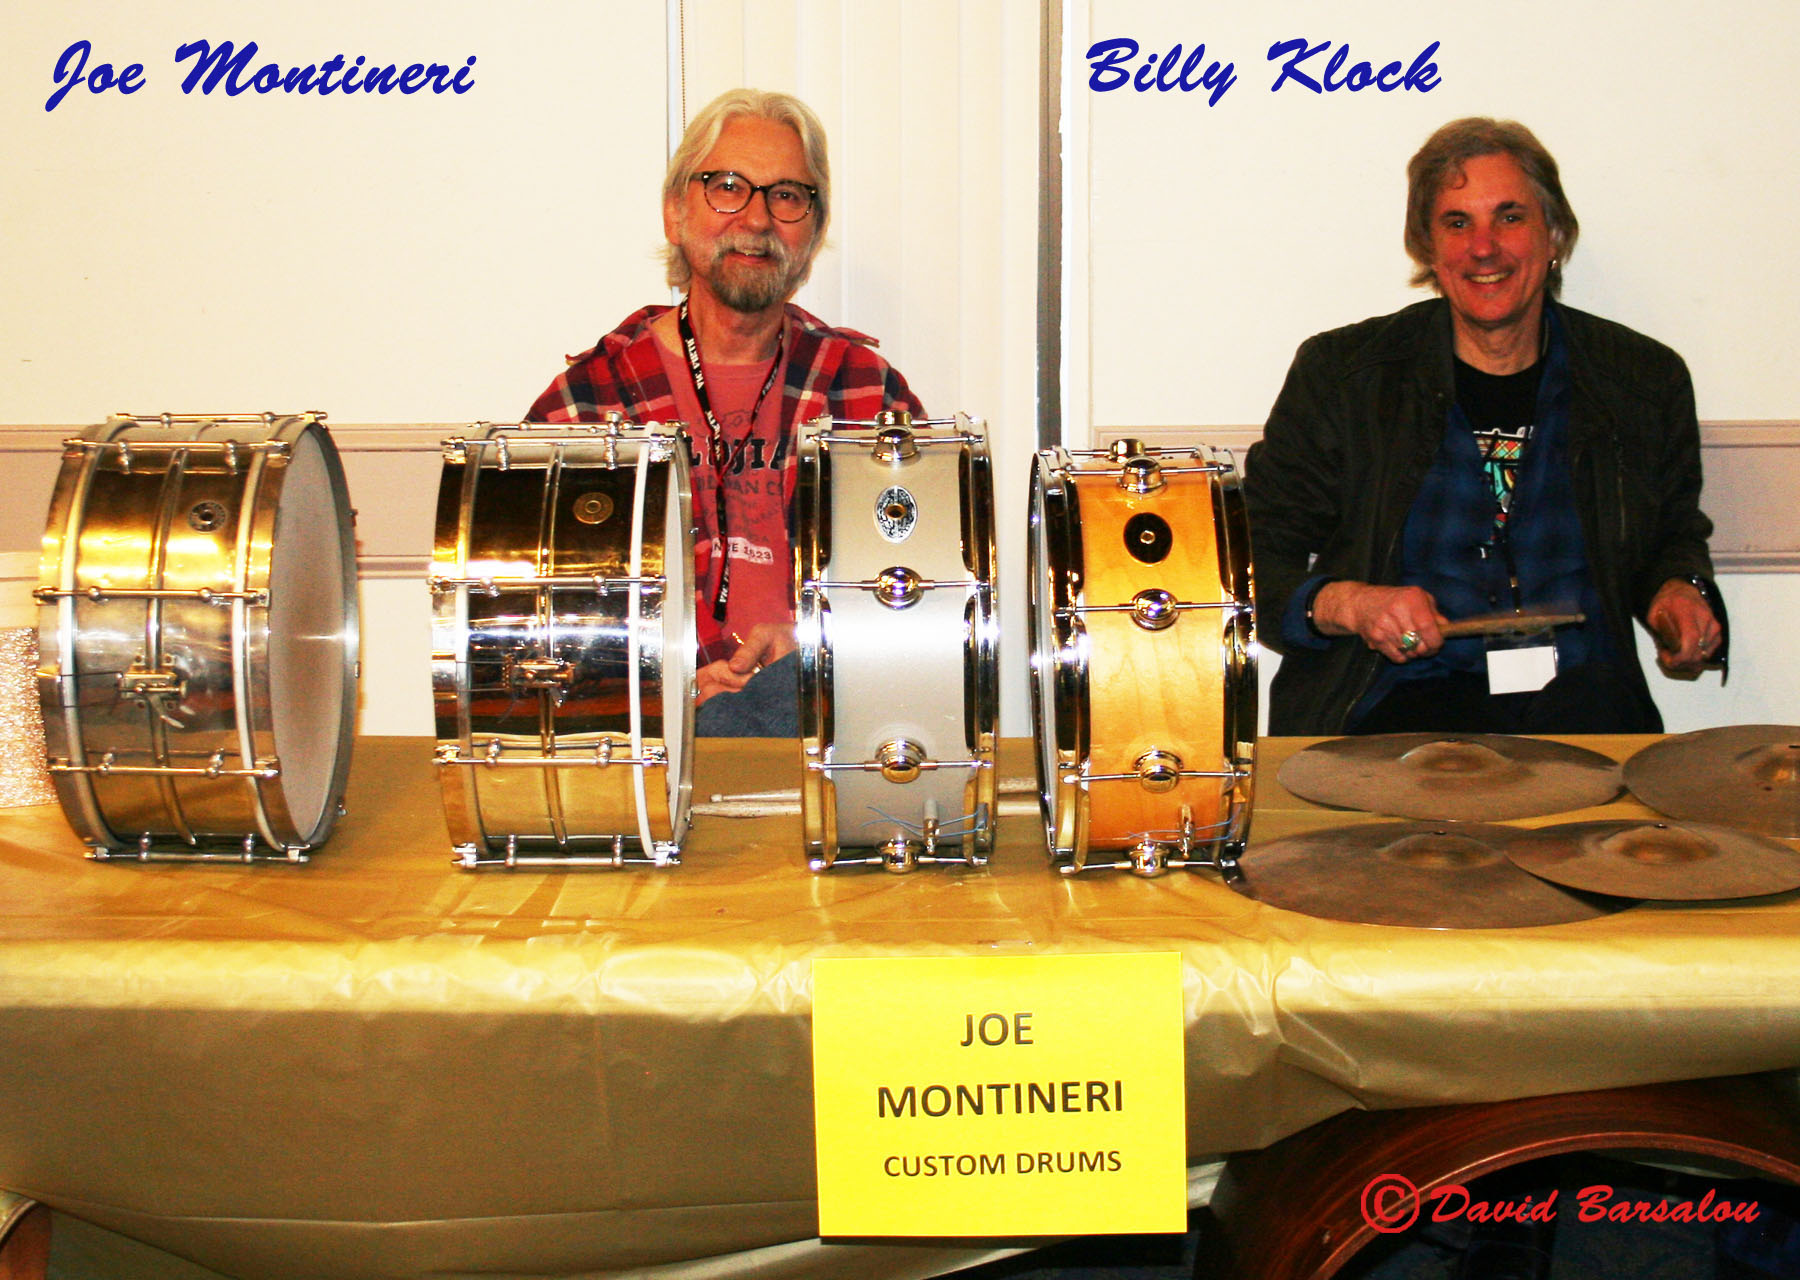 Joe-Montineri-Billy-Klock.jpg